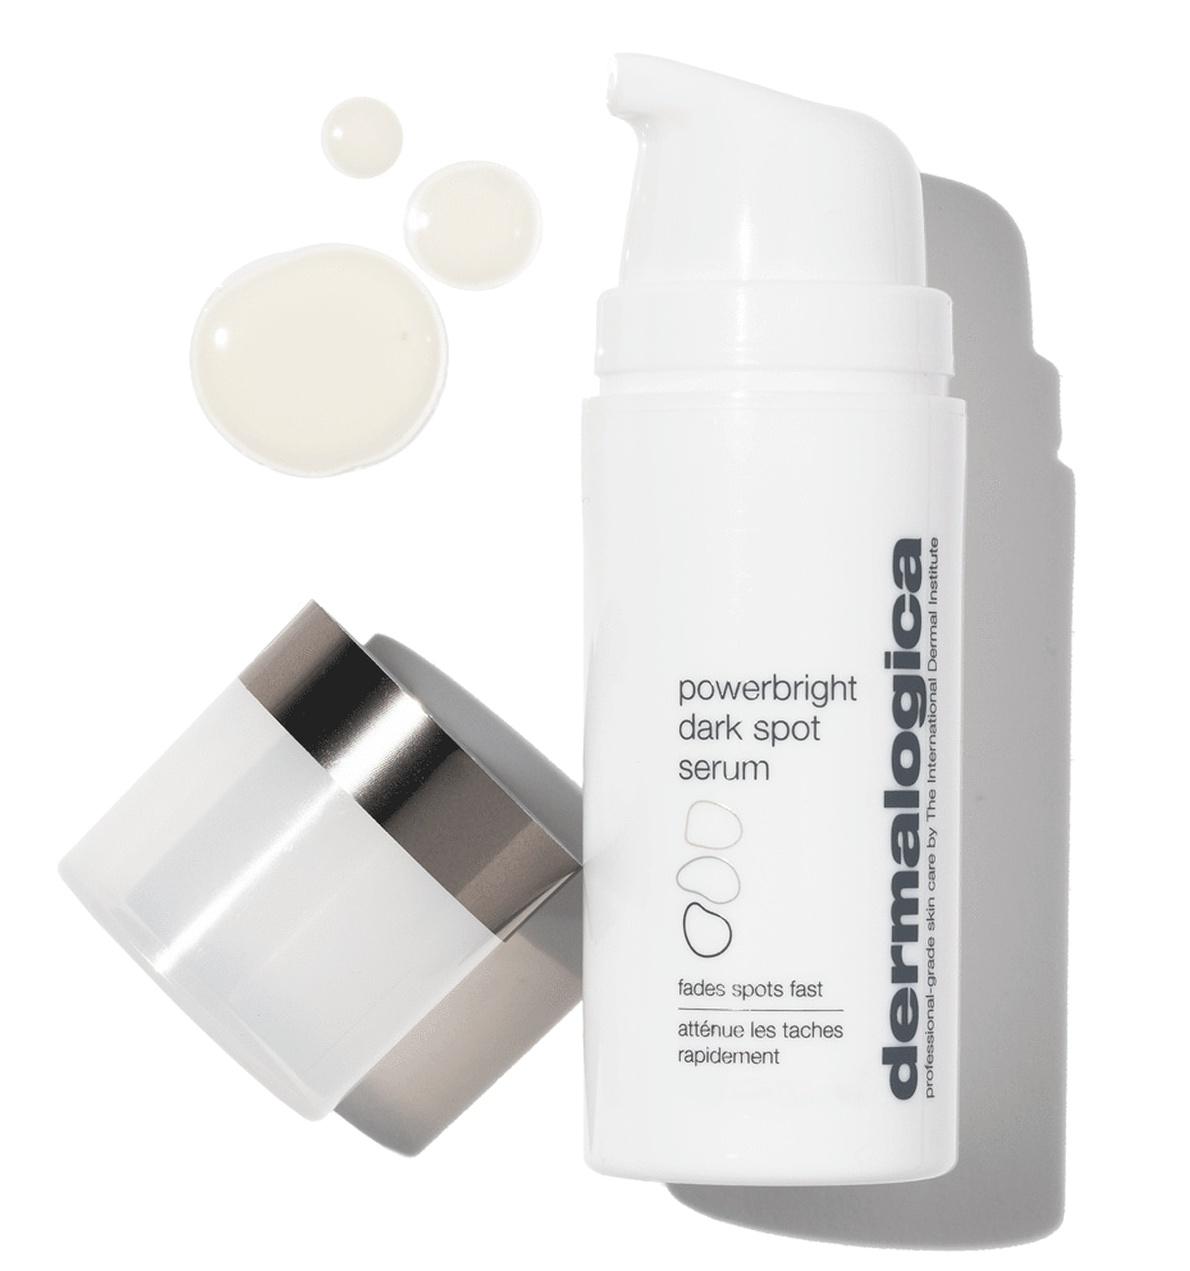 Dermalogica Powerbright - Dark Spot Serum